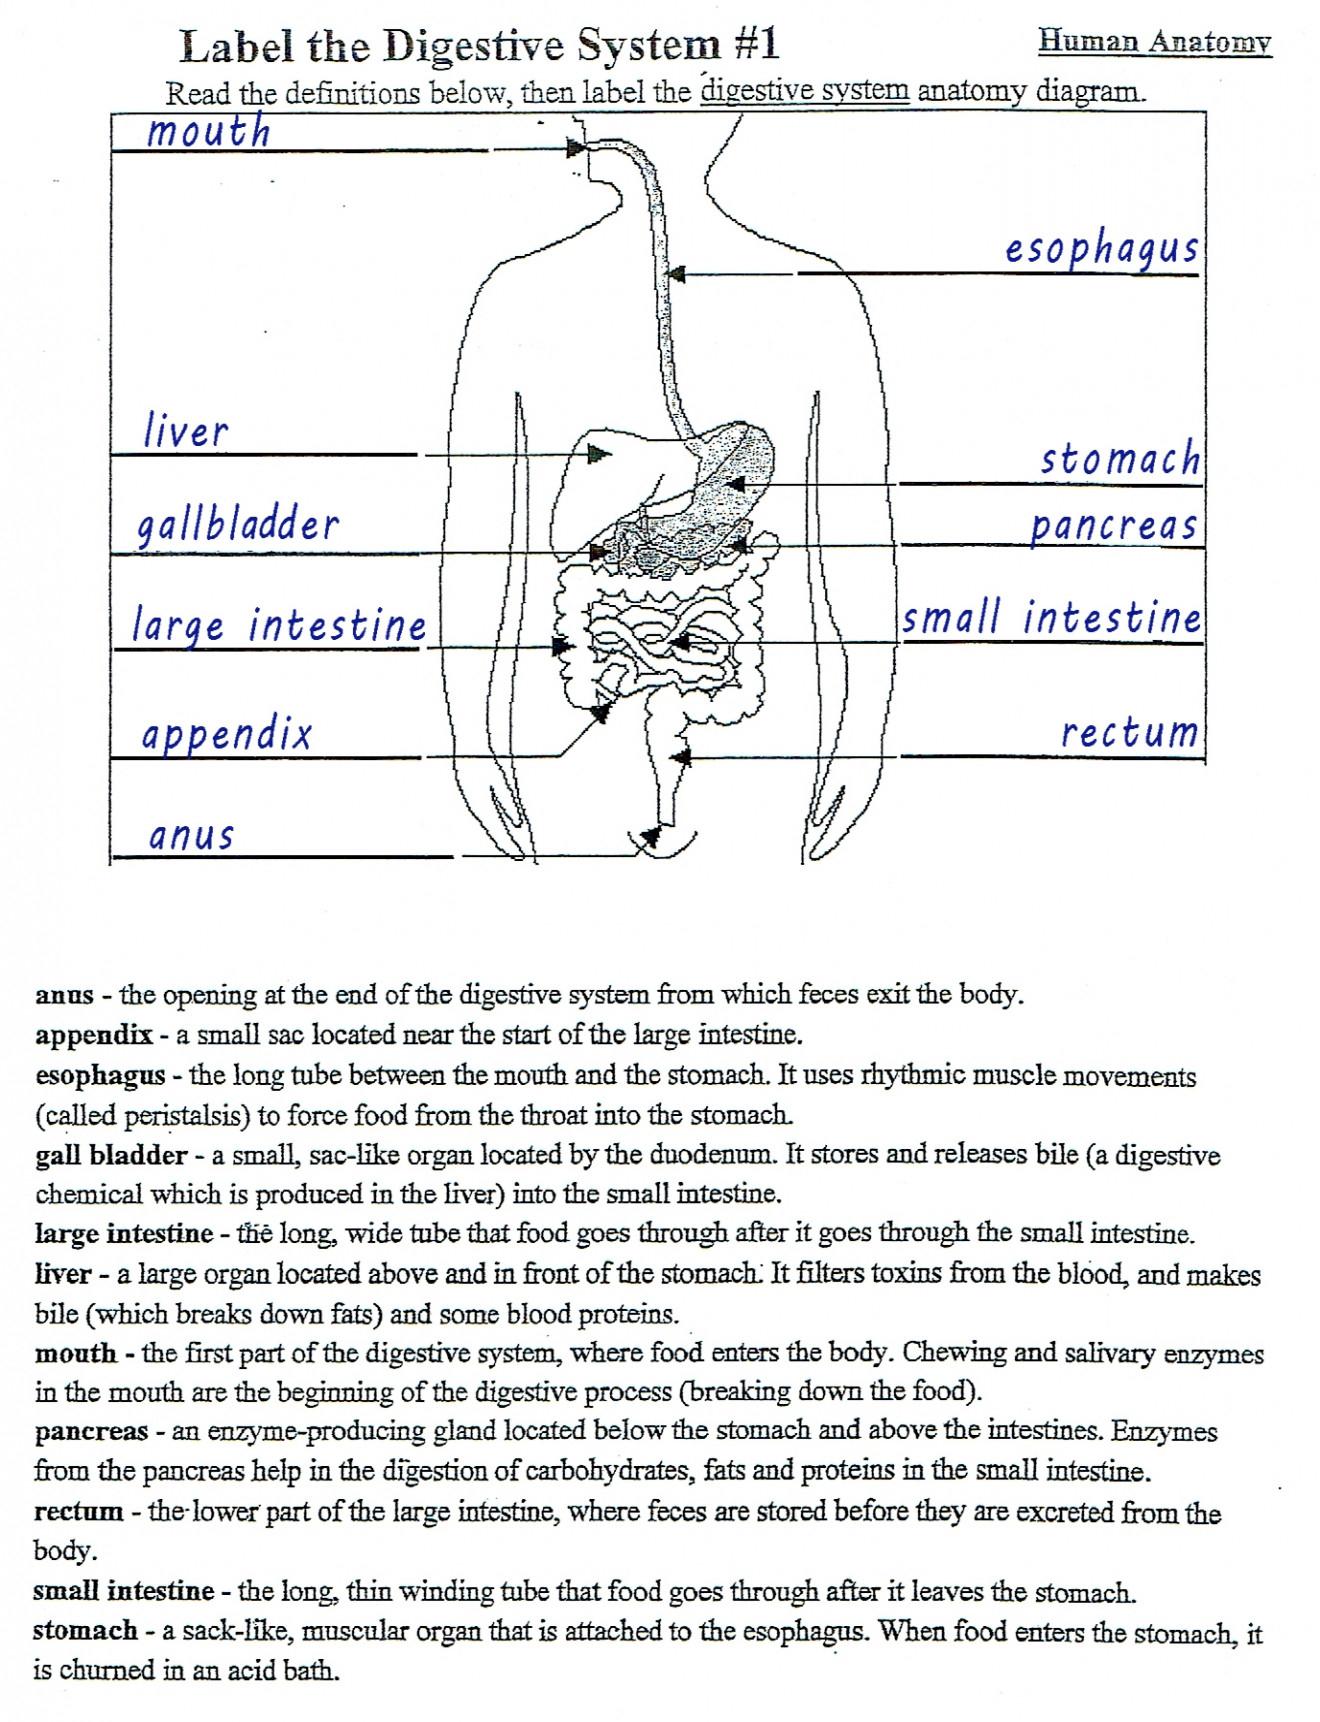 Digestive System Diagram Worksheet Anatomy Of The Digestive System Key Wwwzionschool